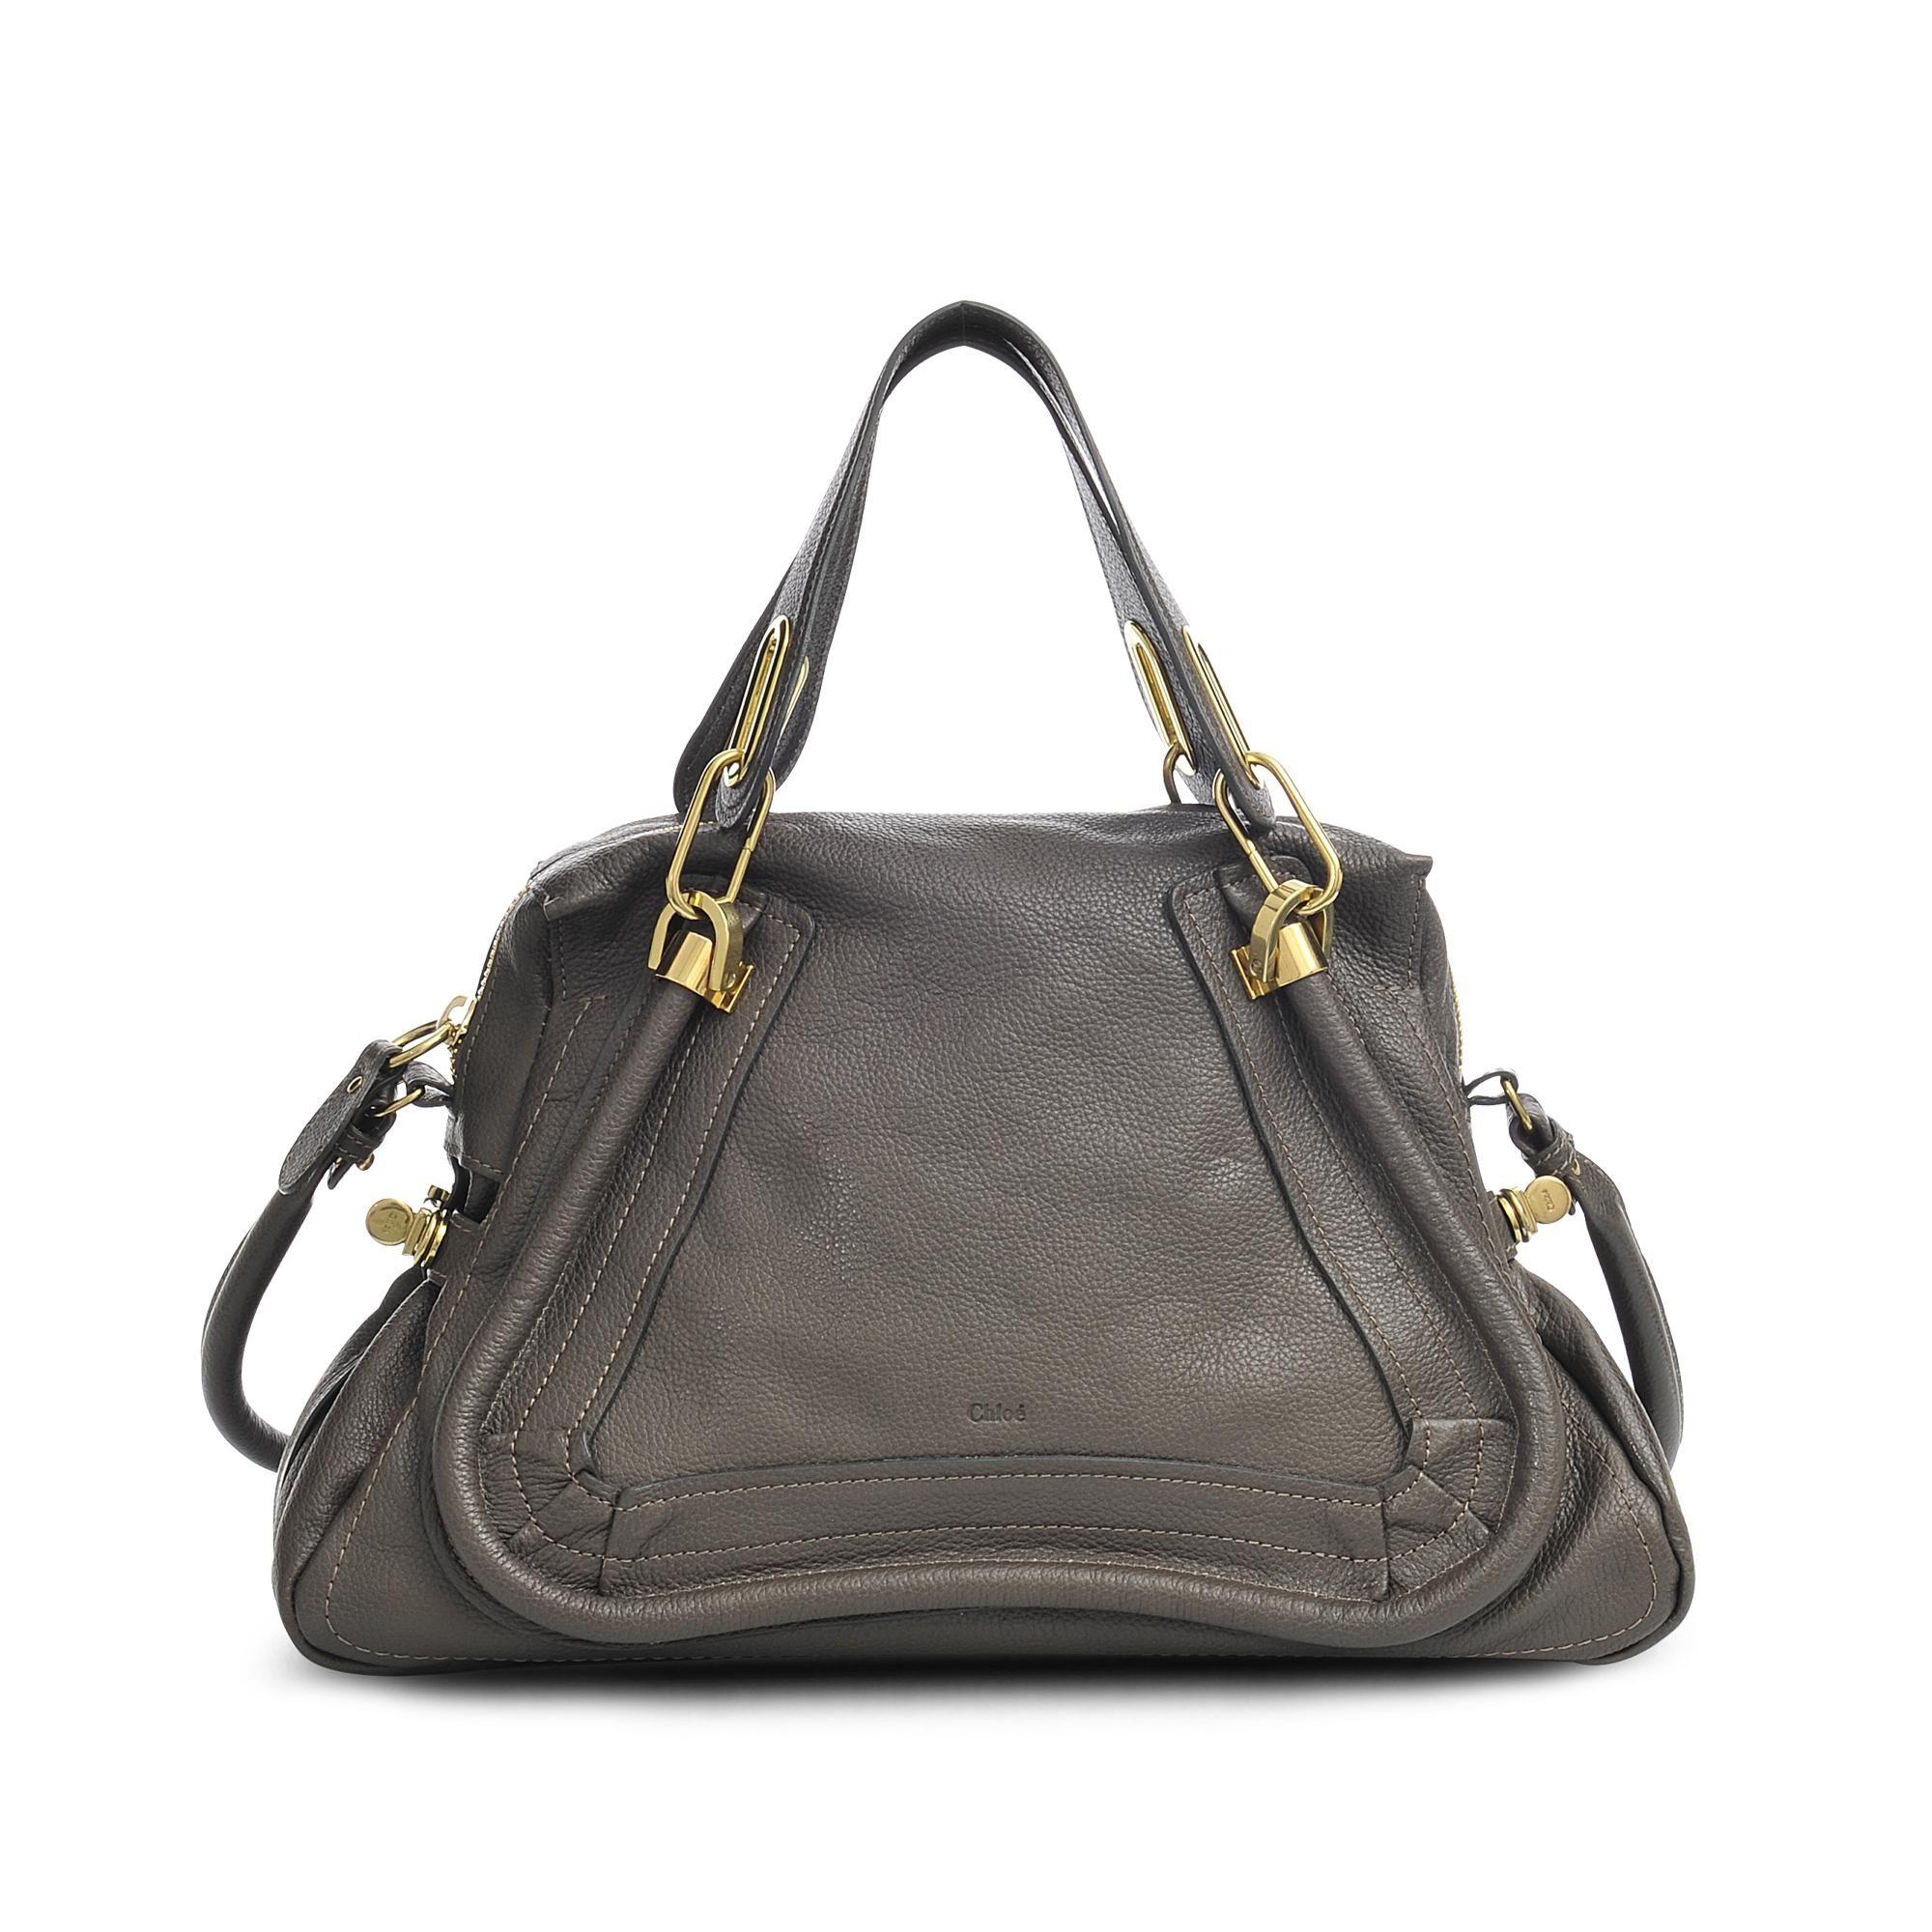 Sac FrèresMy Monnier Grand Chloé Style Bags Paraty HIWEY9D2